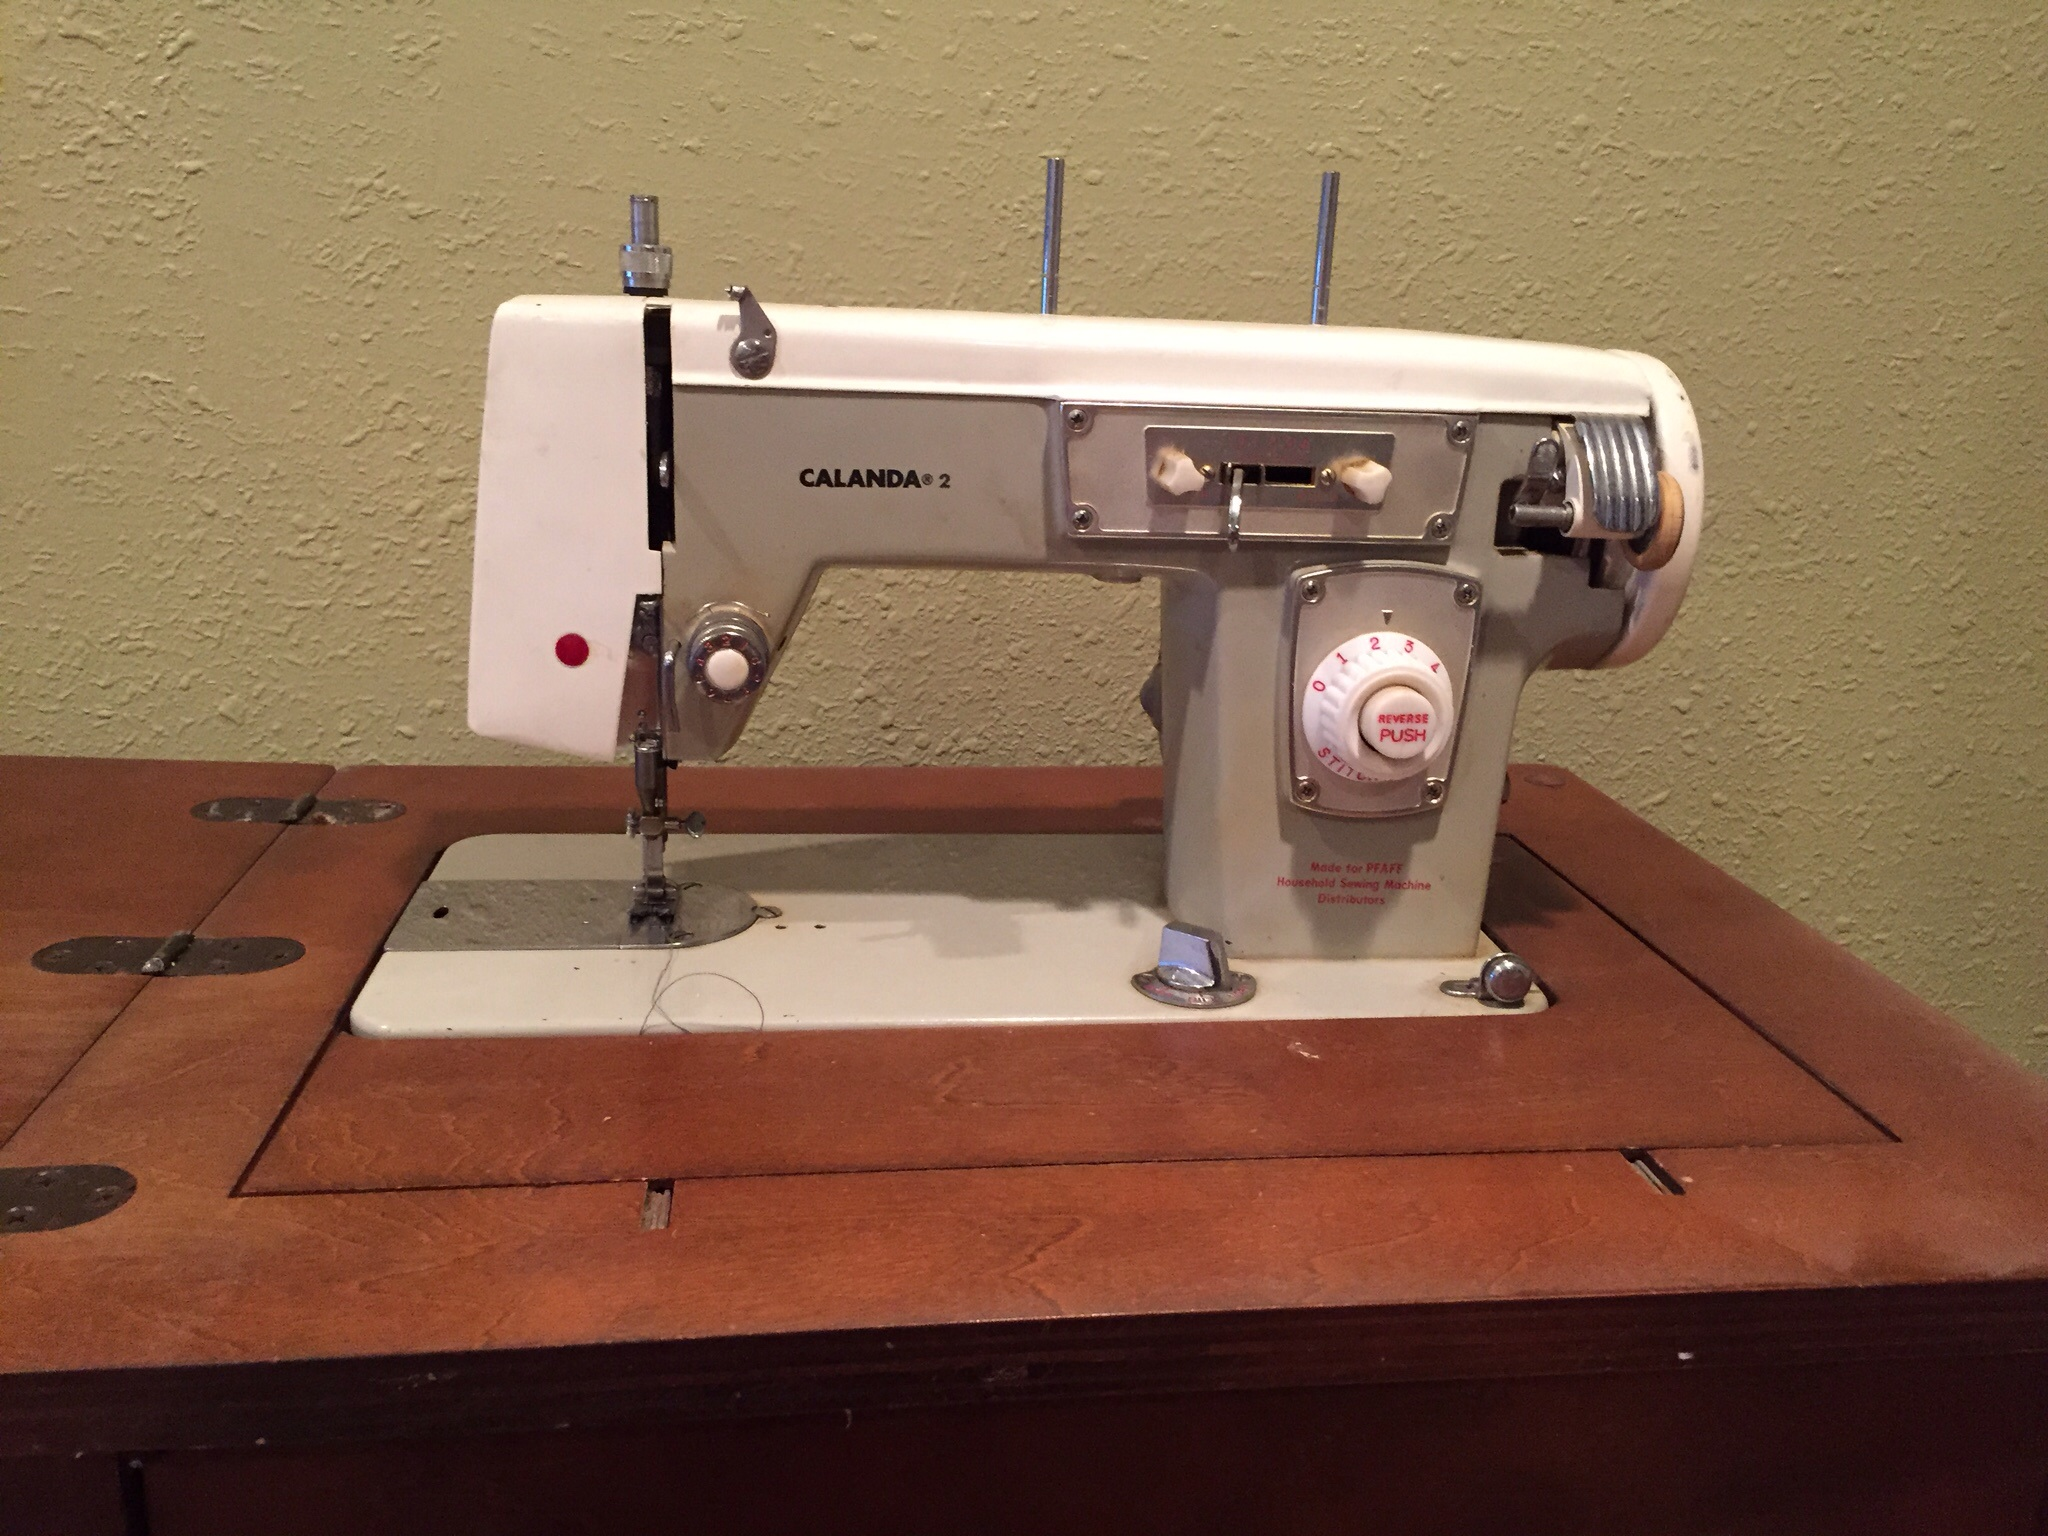 PFAFF calanda 2 Cabinet Sewing Machine antique appraisal ...